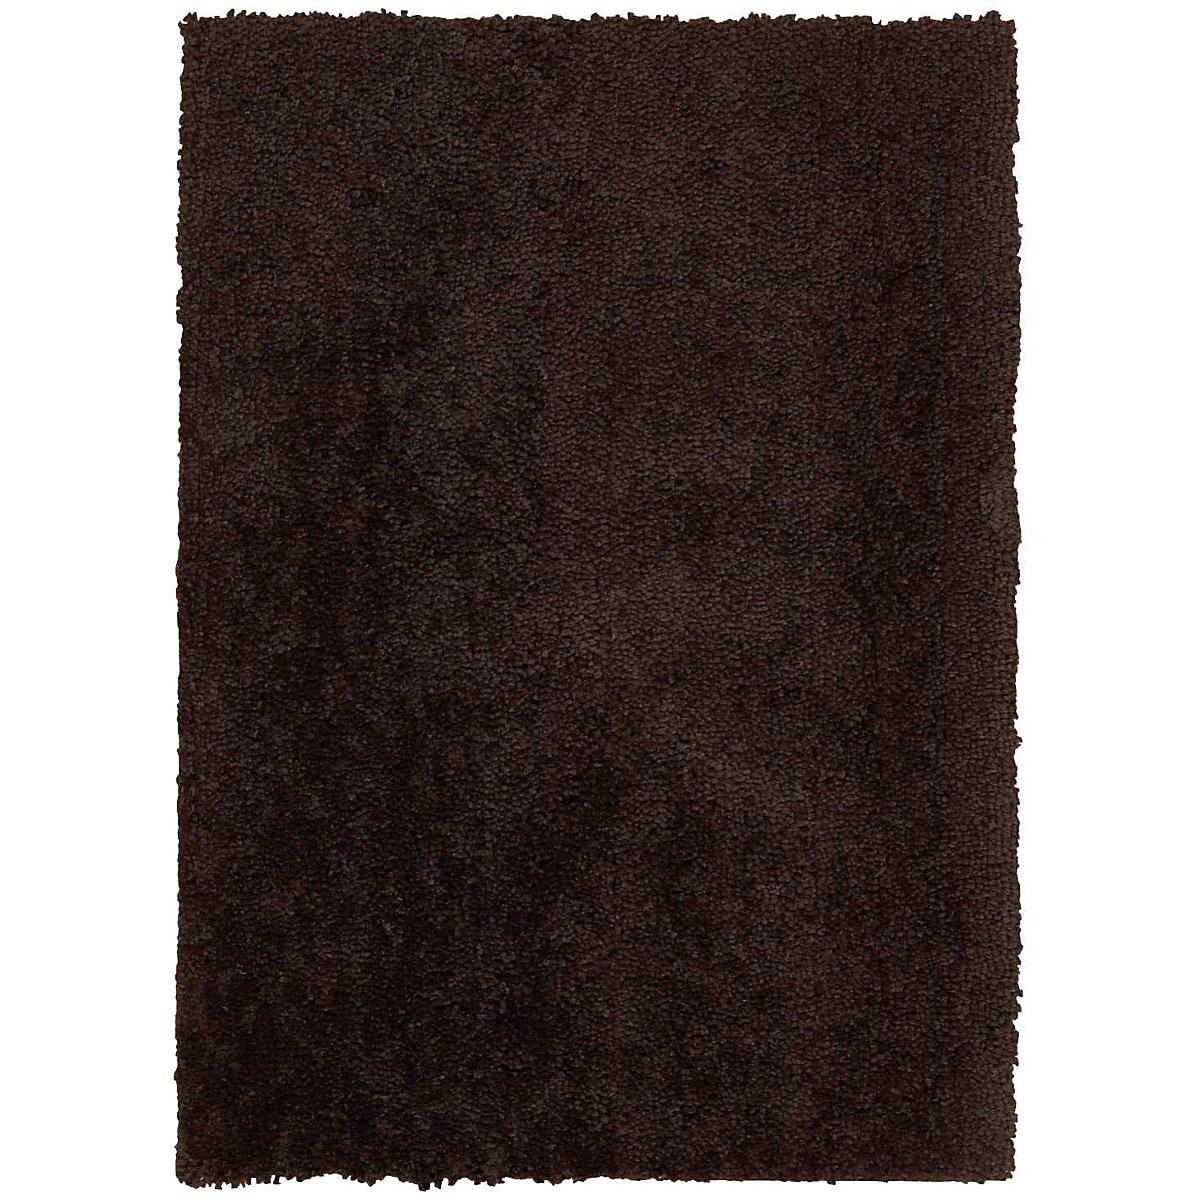 Puli Dark Brown 5X7 Area Rug